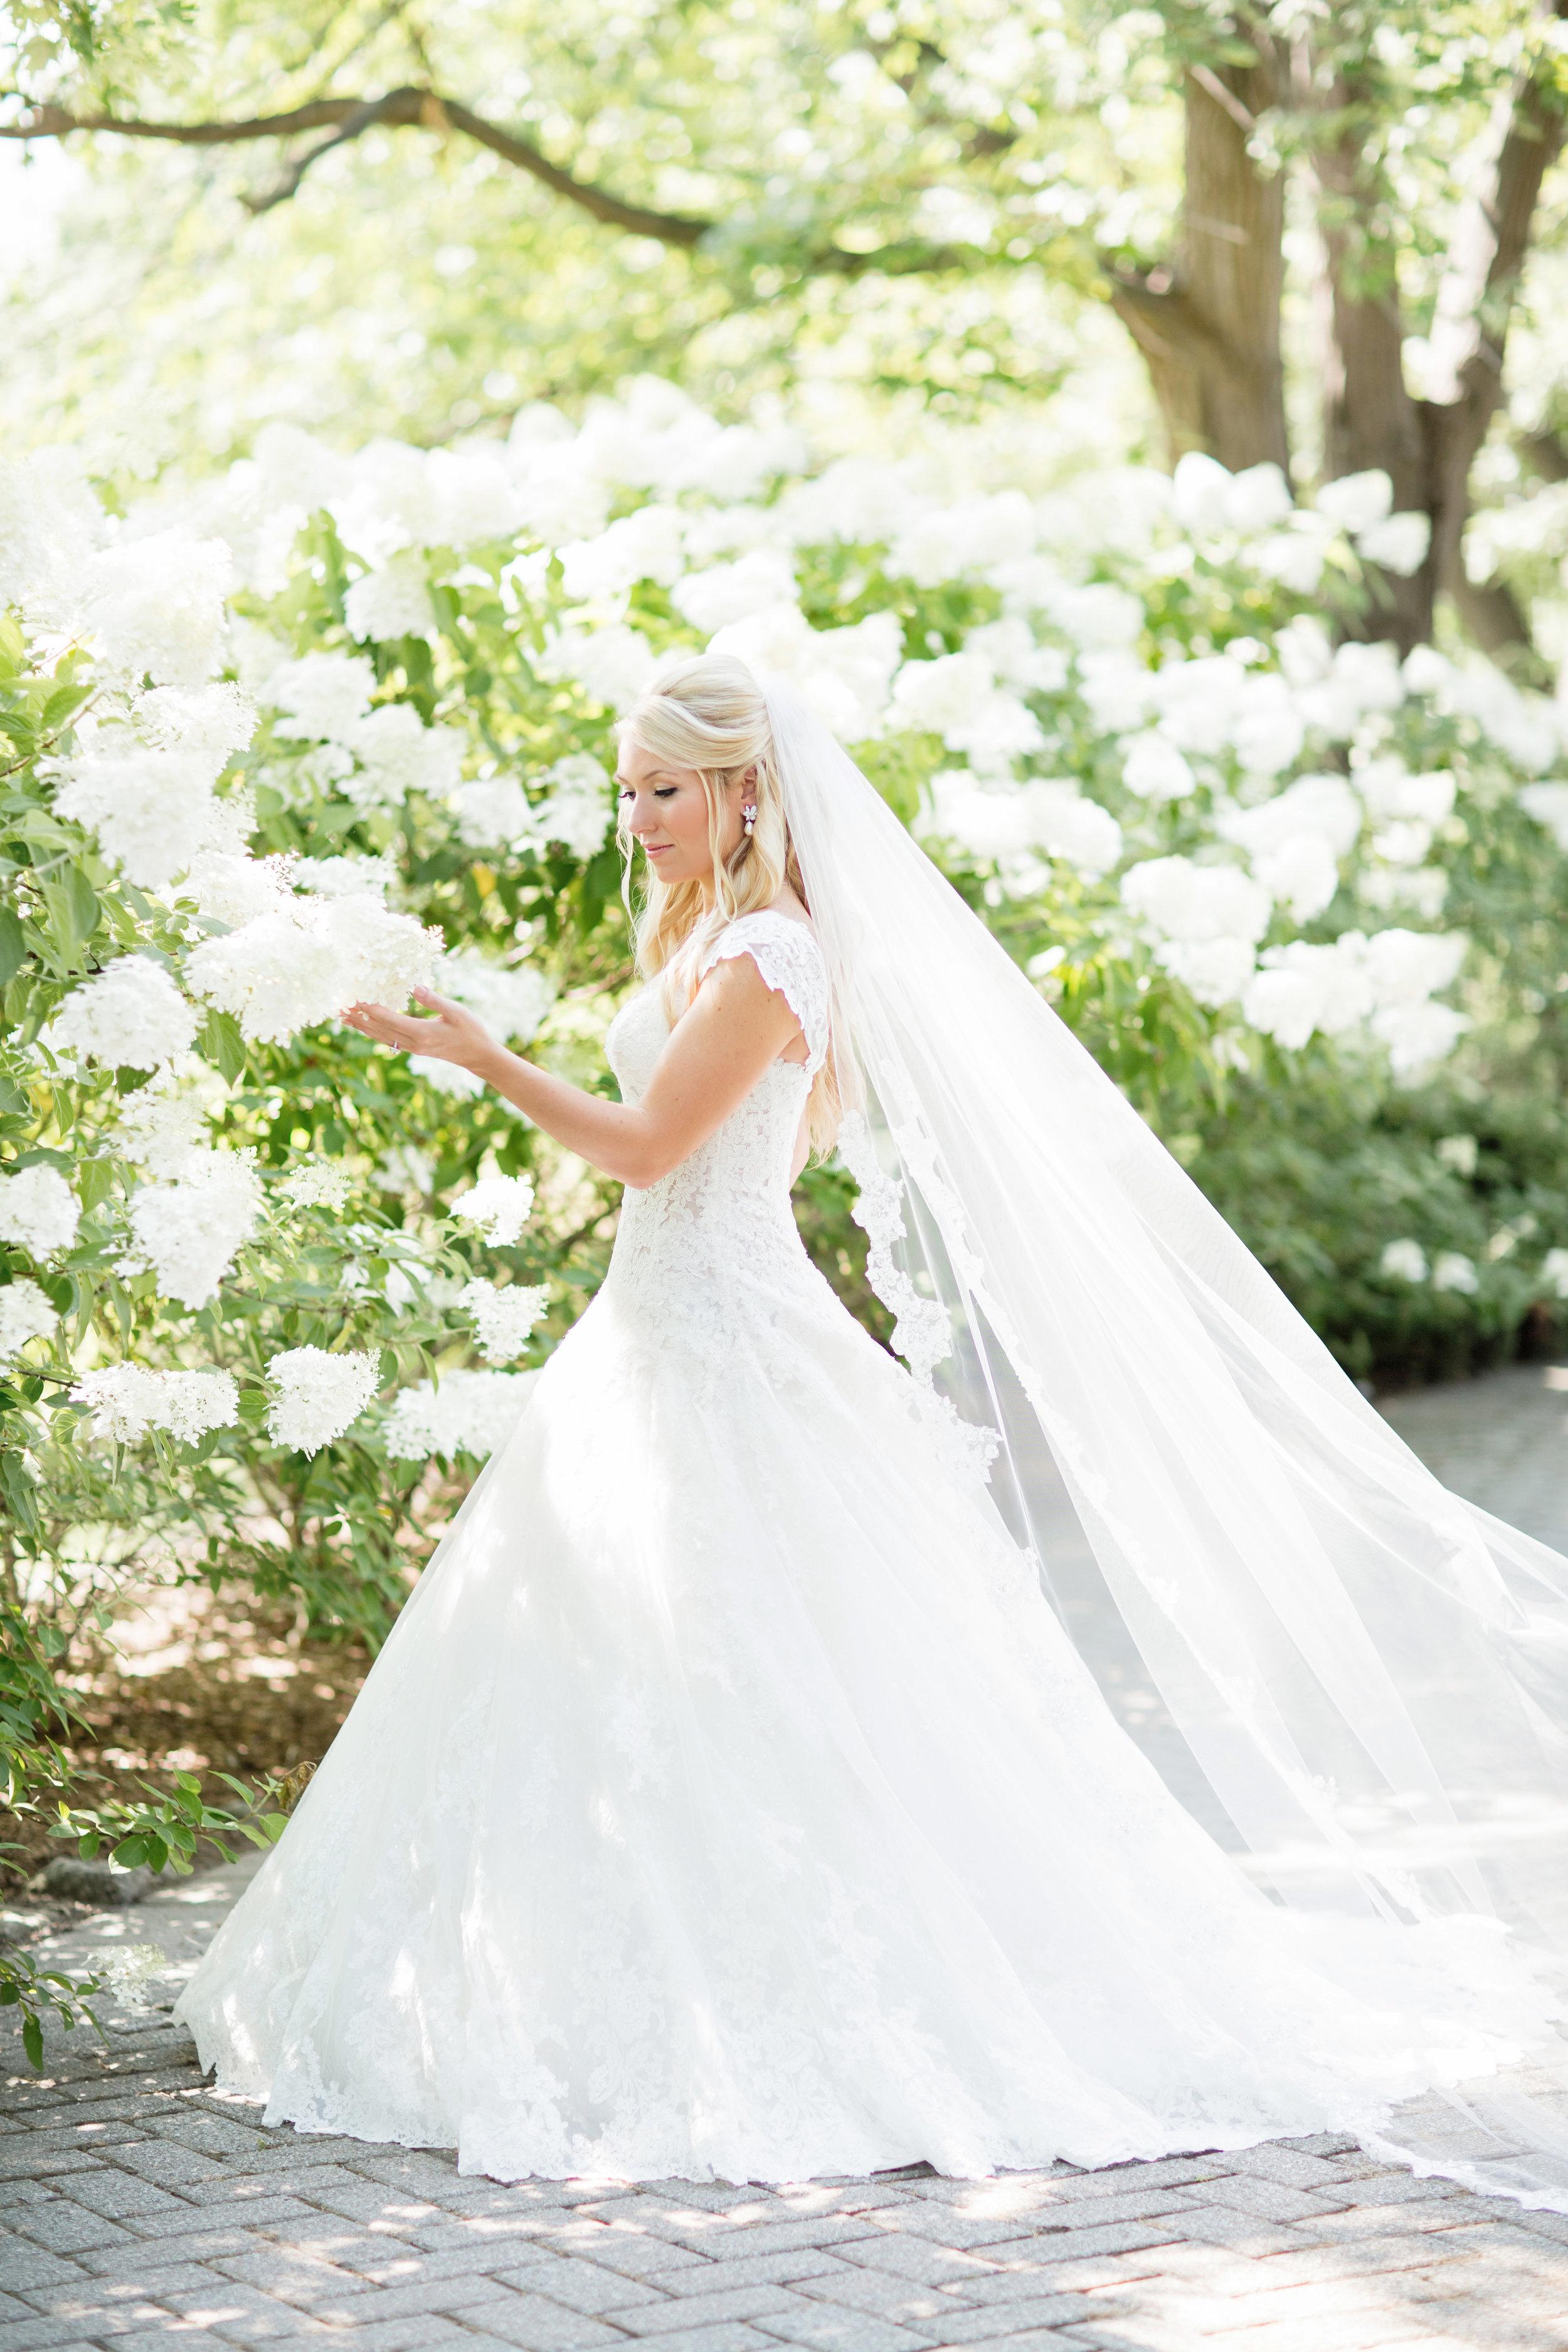 windsor-toronto-ontario-wedding-photographer-eryn-shea-photography-03.JPG